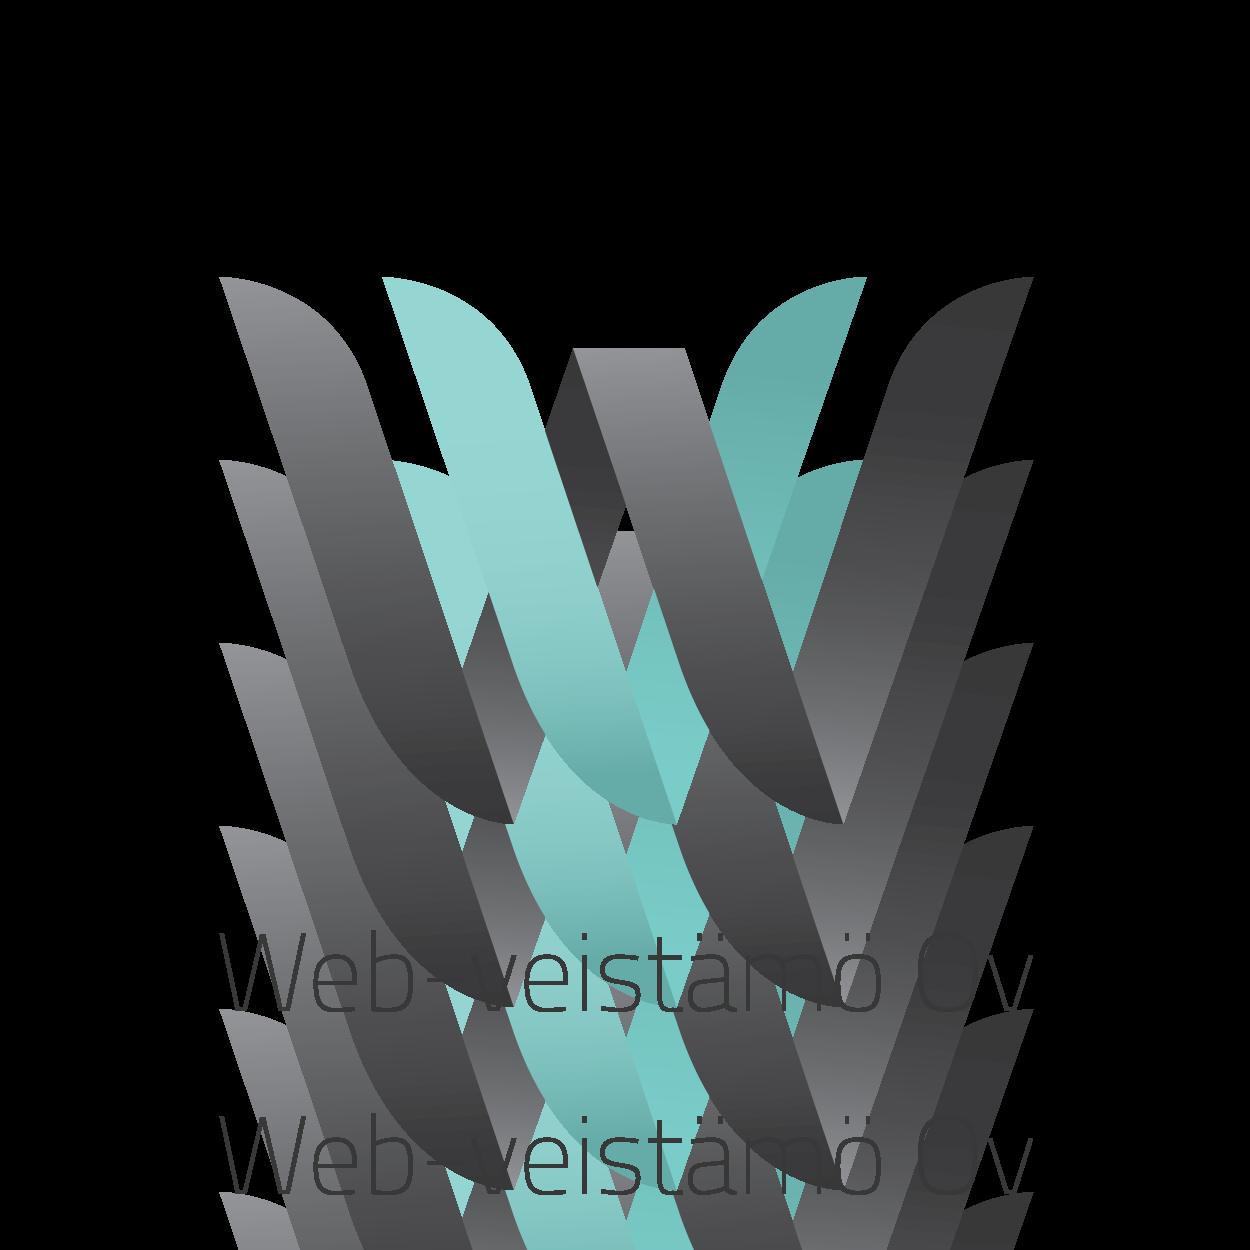 web-veistamo--logo